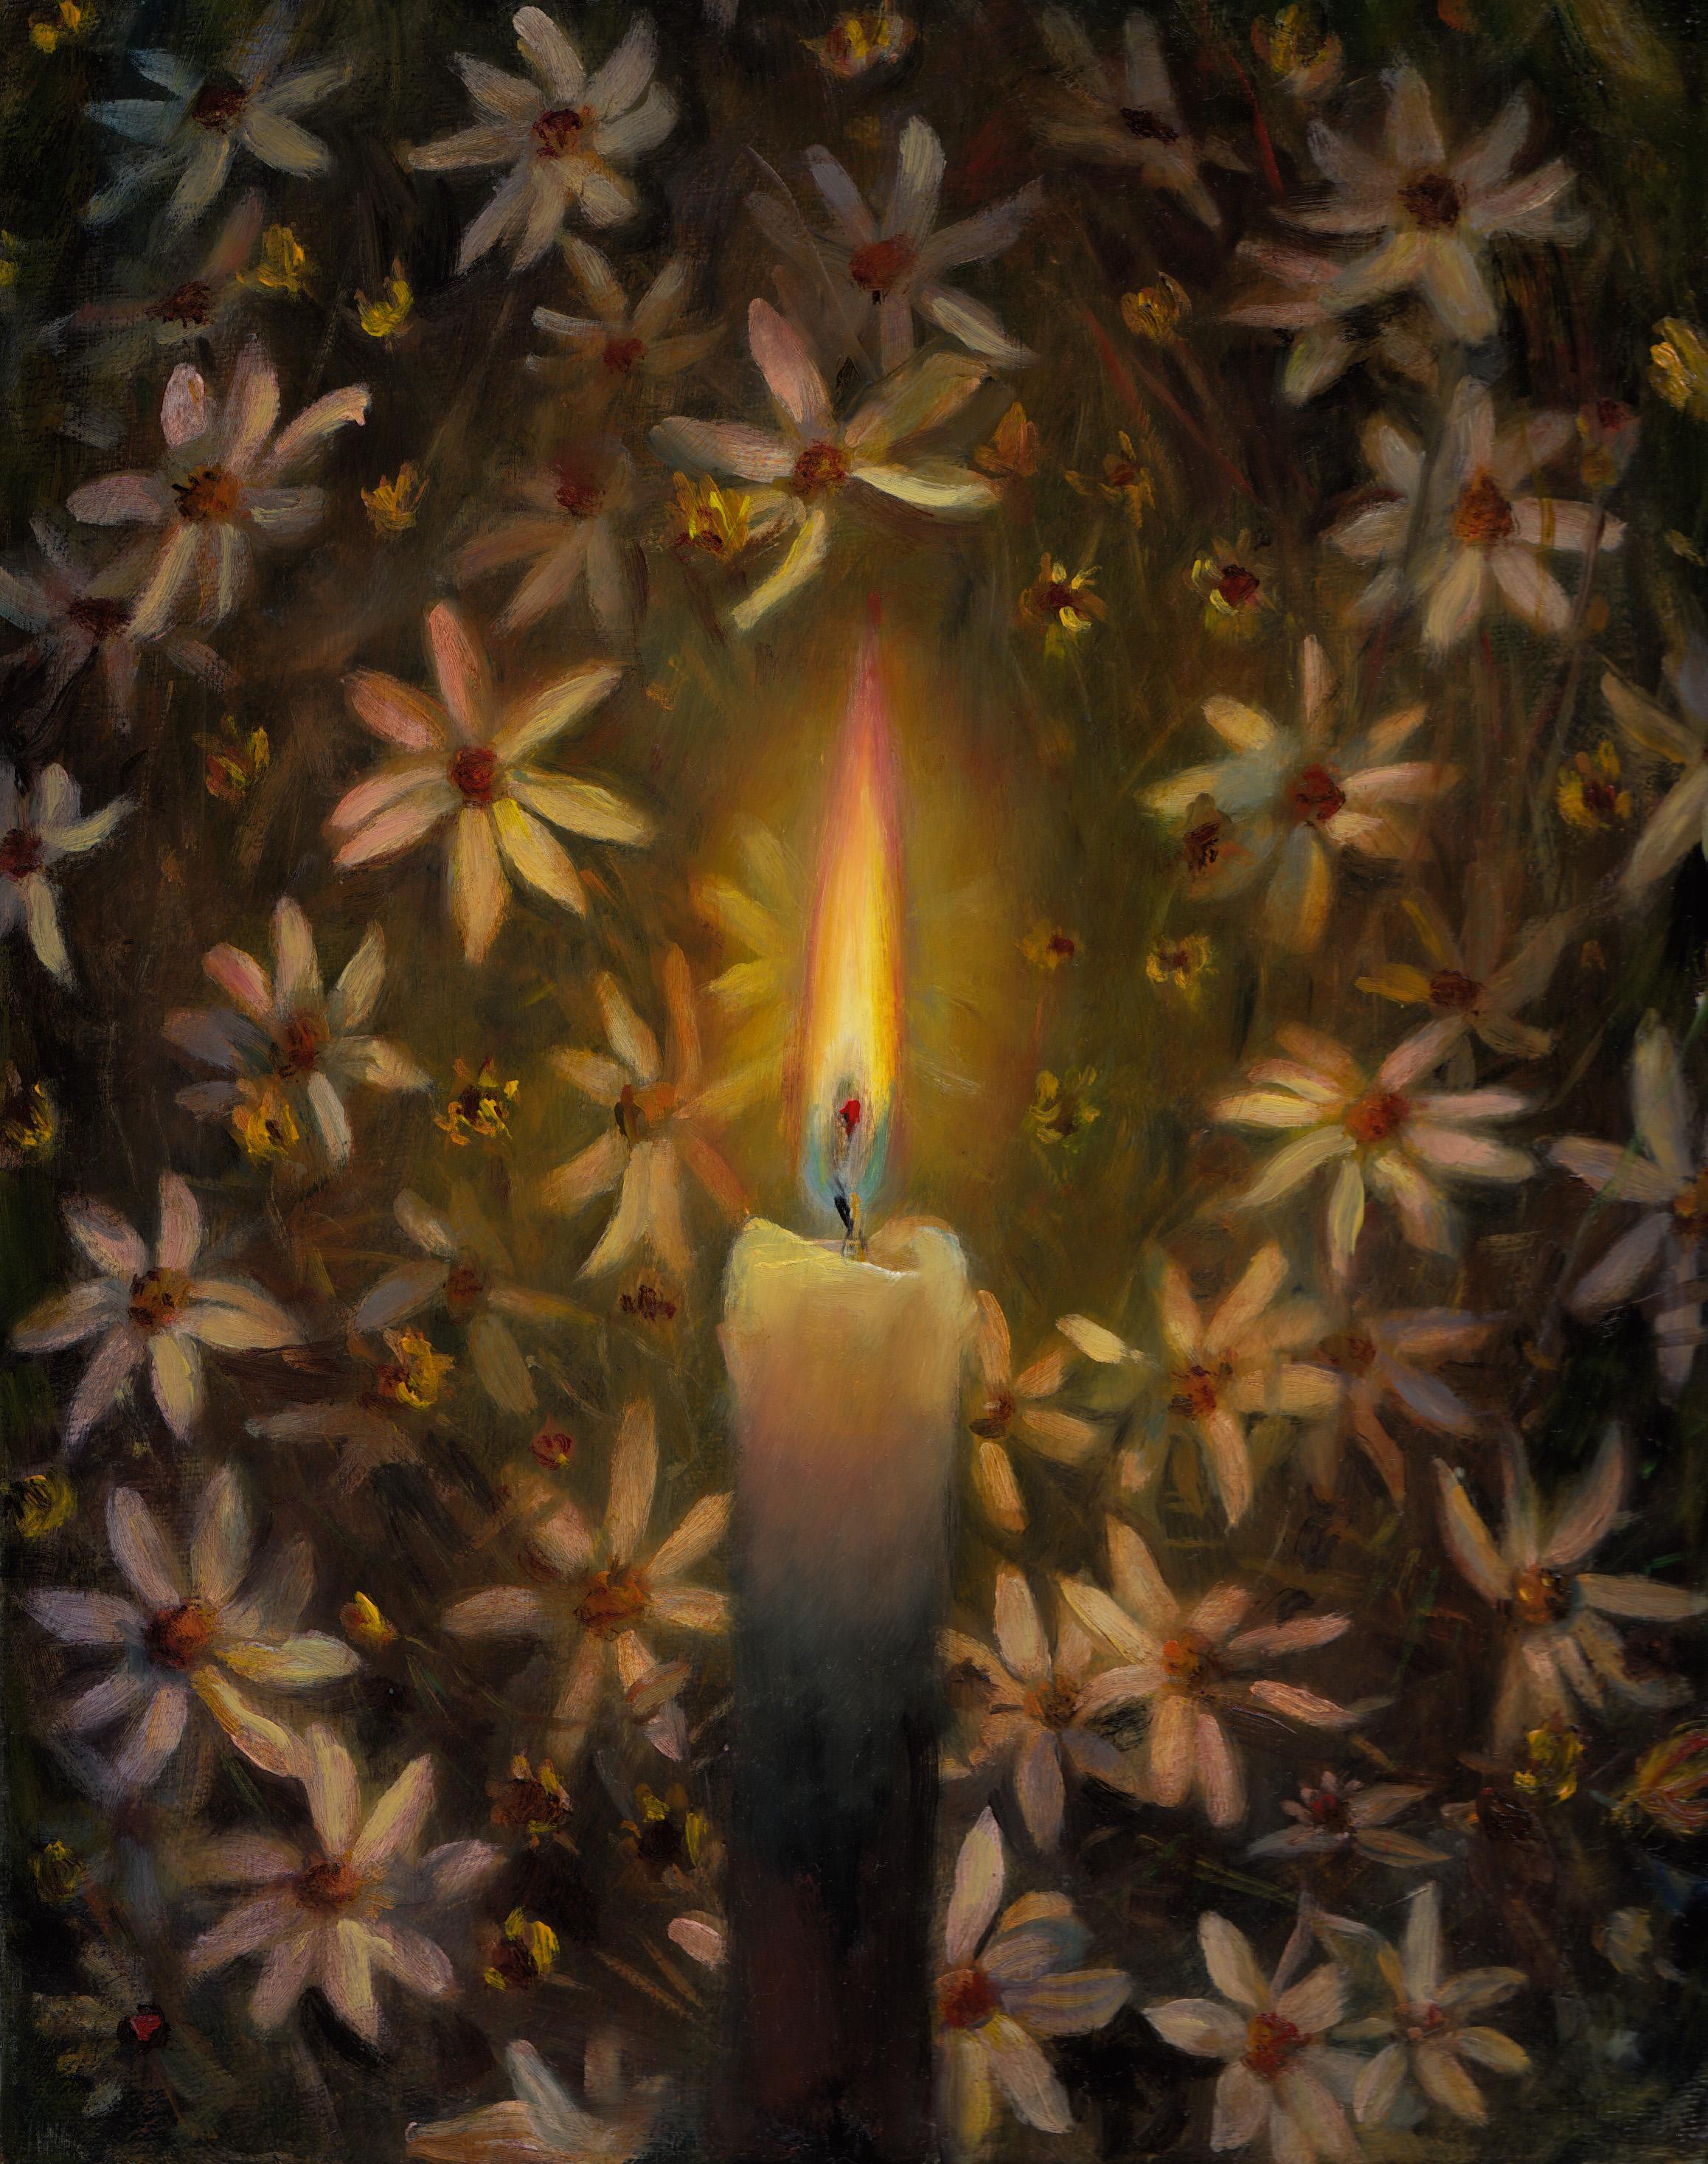 TM Davy, 'Candela – Daisies'. Courtesy the artist